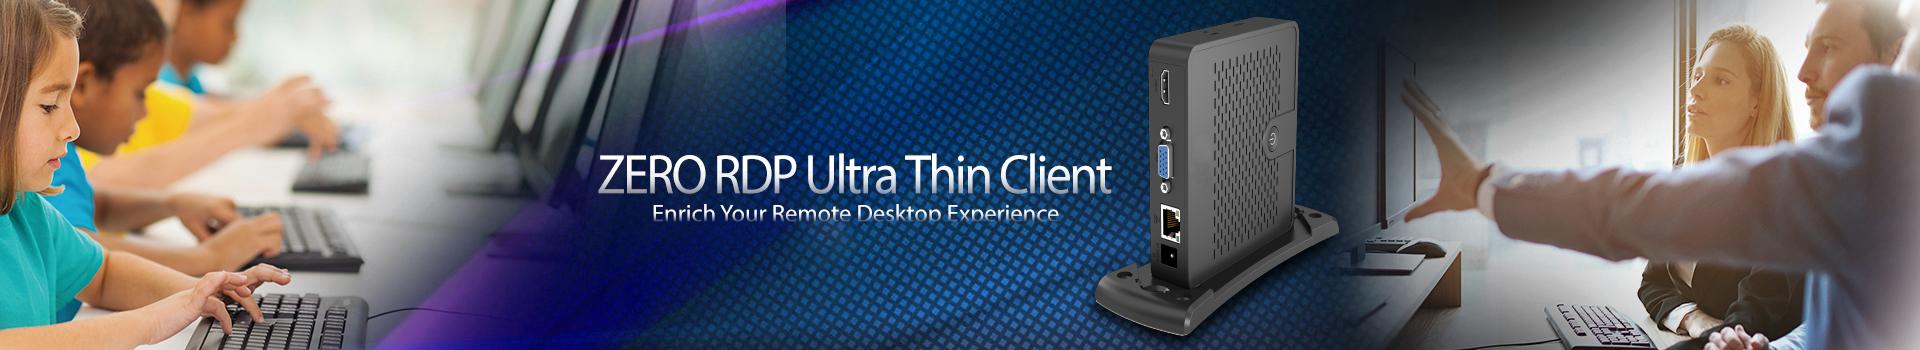 MCT zRDP405 Zero RDP Ultra Thin Client - Magic Control